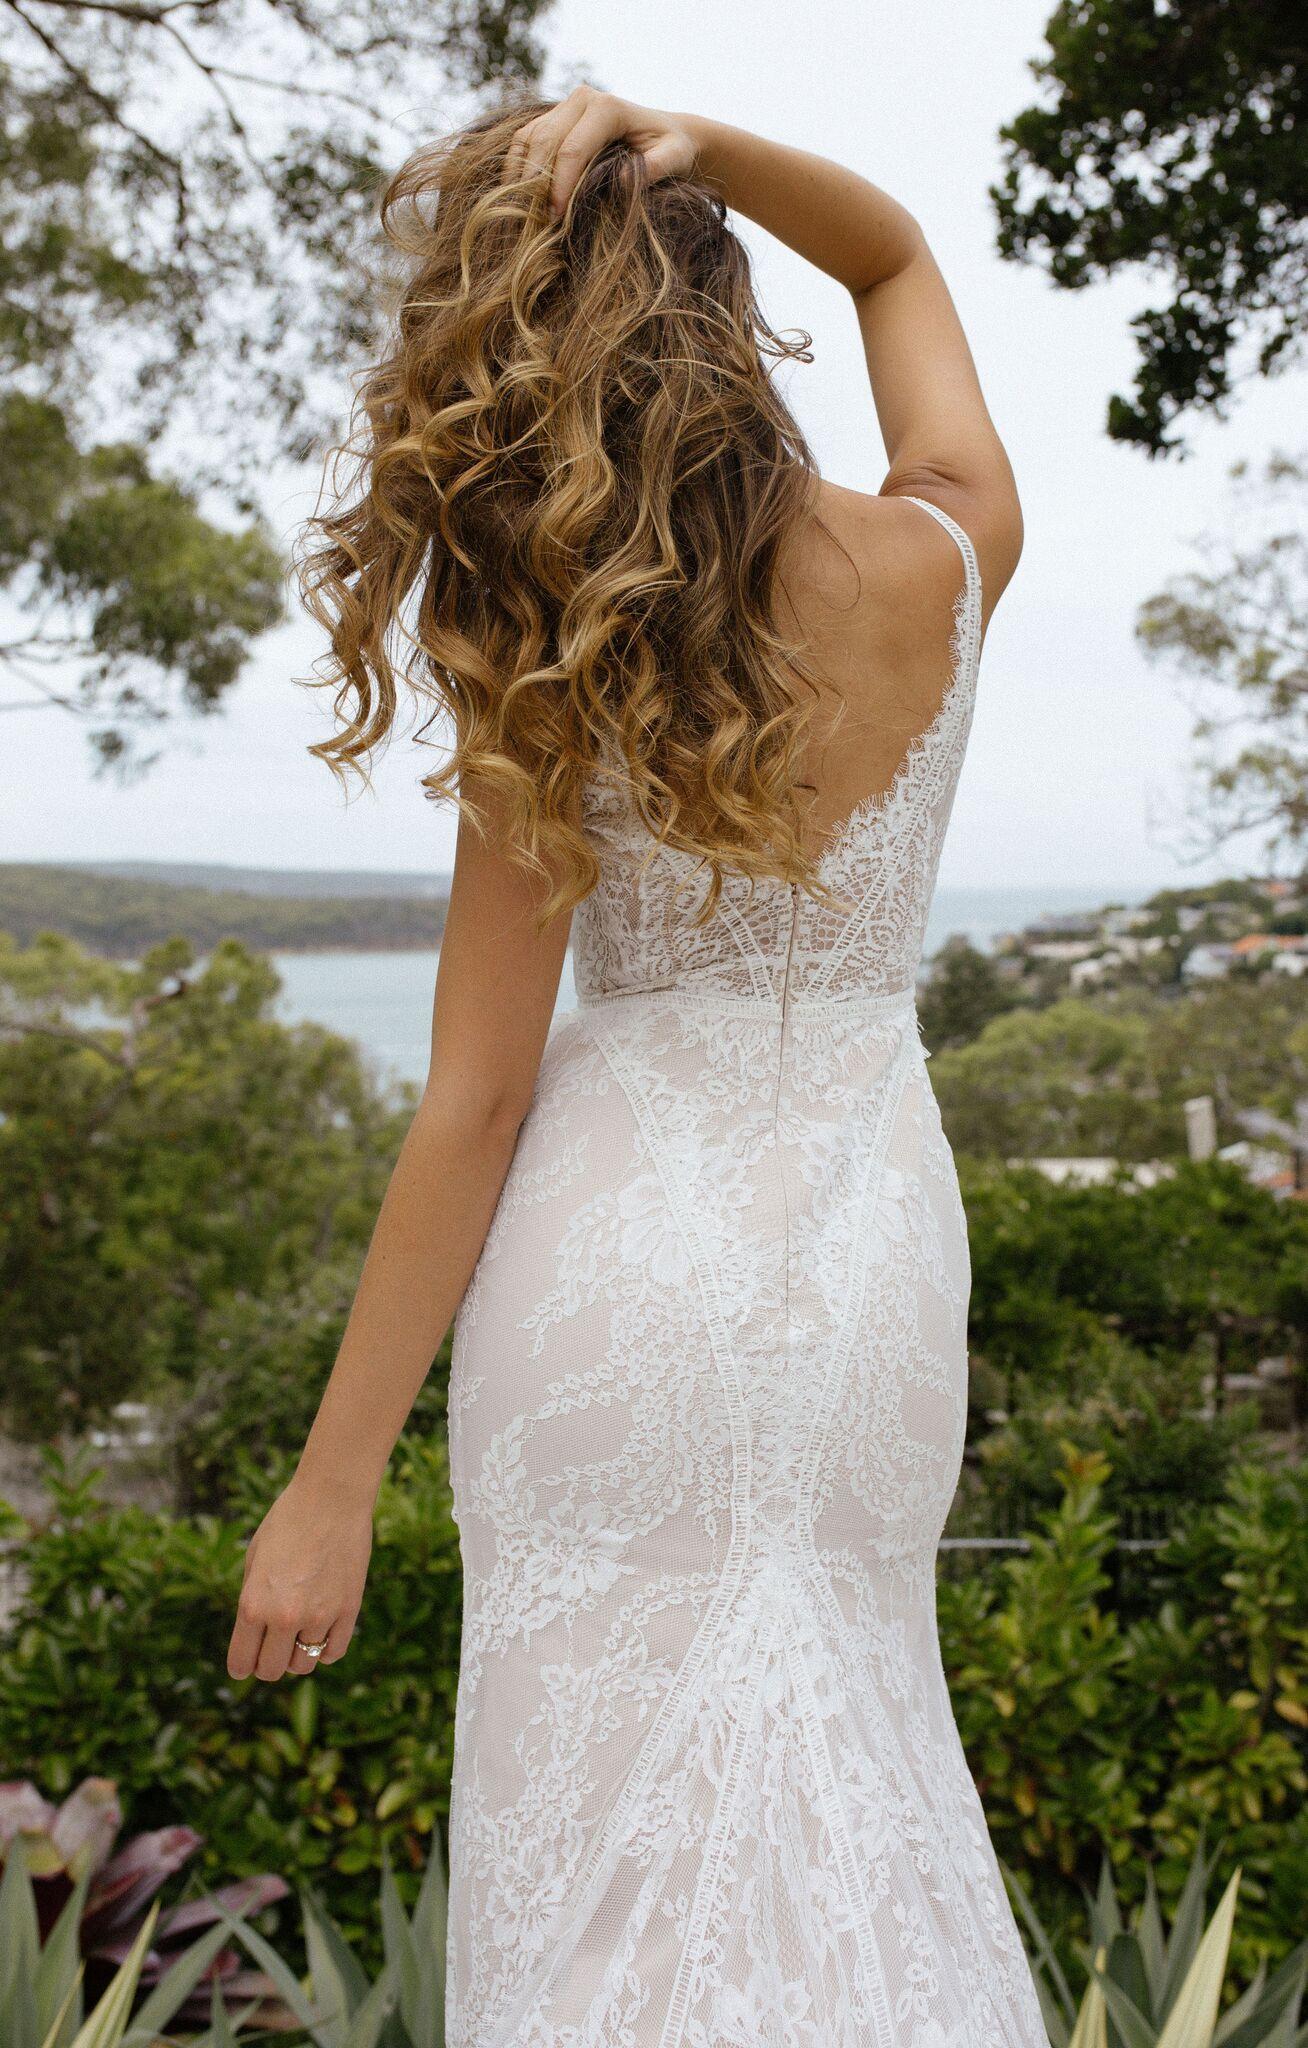 EZRA - LUV Bridal | Wedding dresses, Destination wedding ...